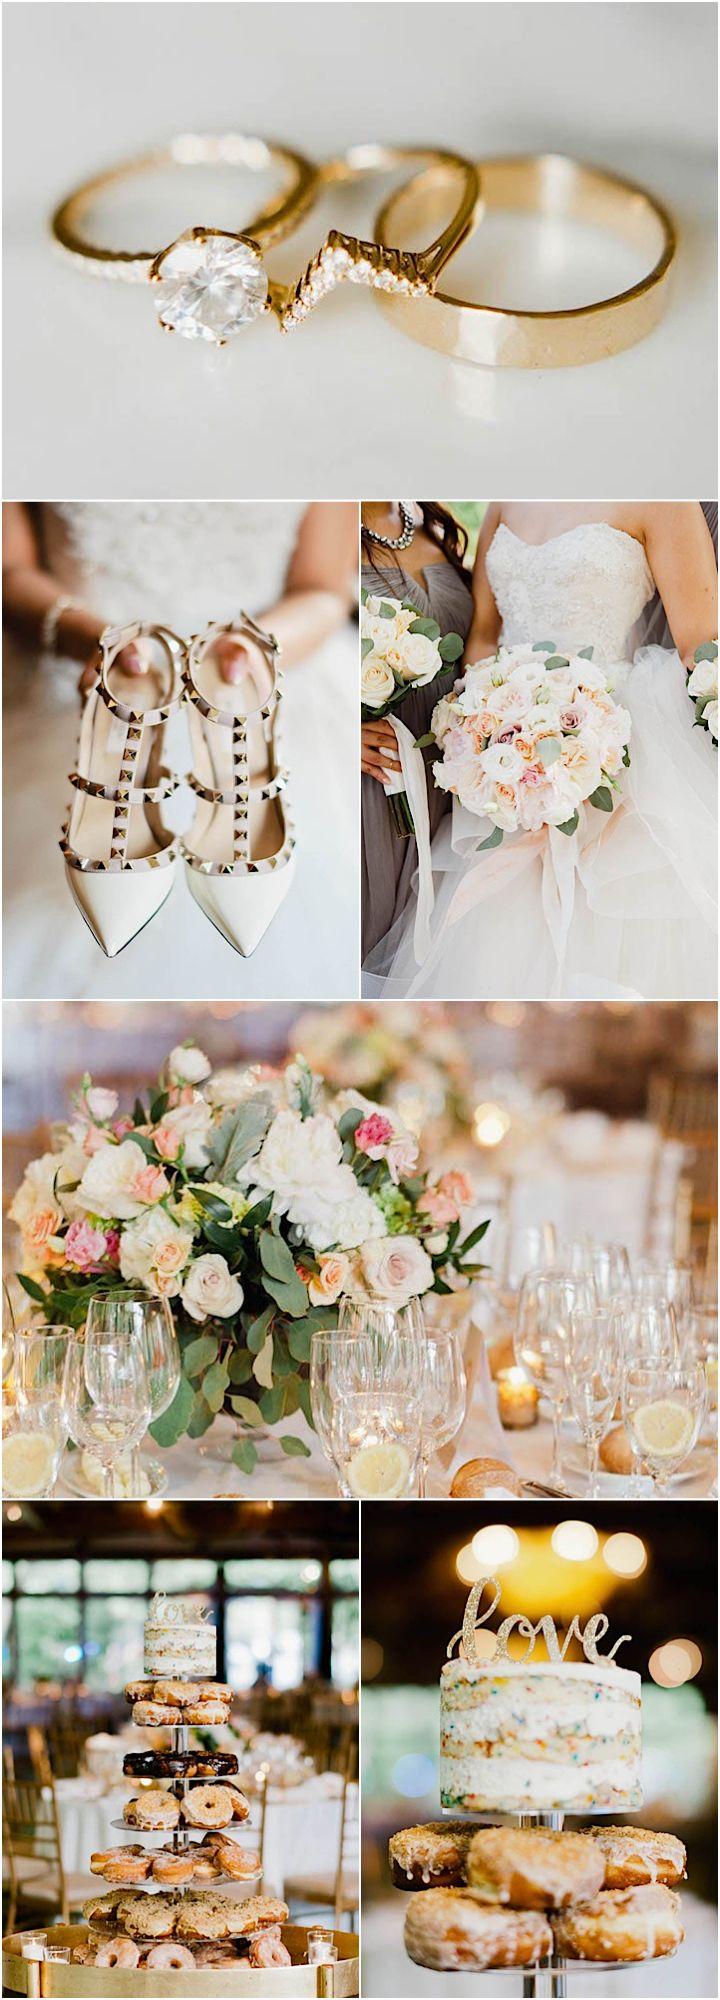 Featured Photographer: Merari Photography; chic wedding details